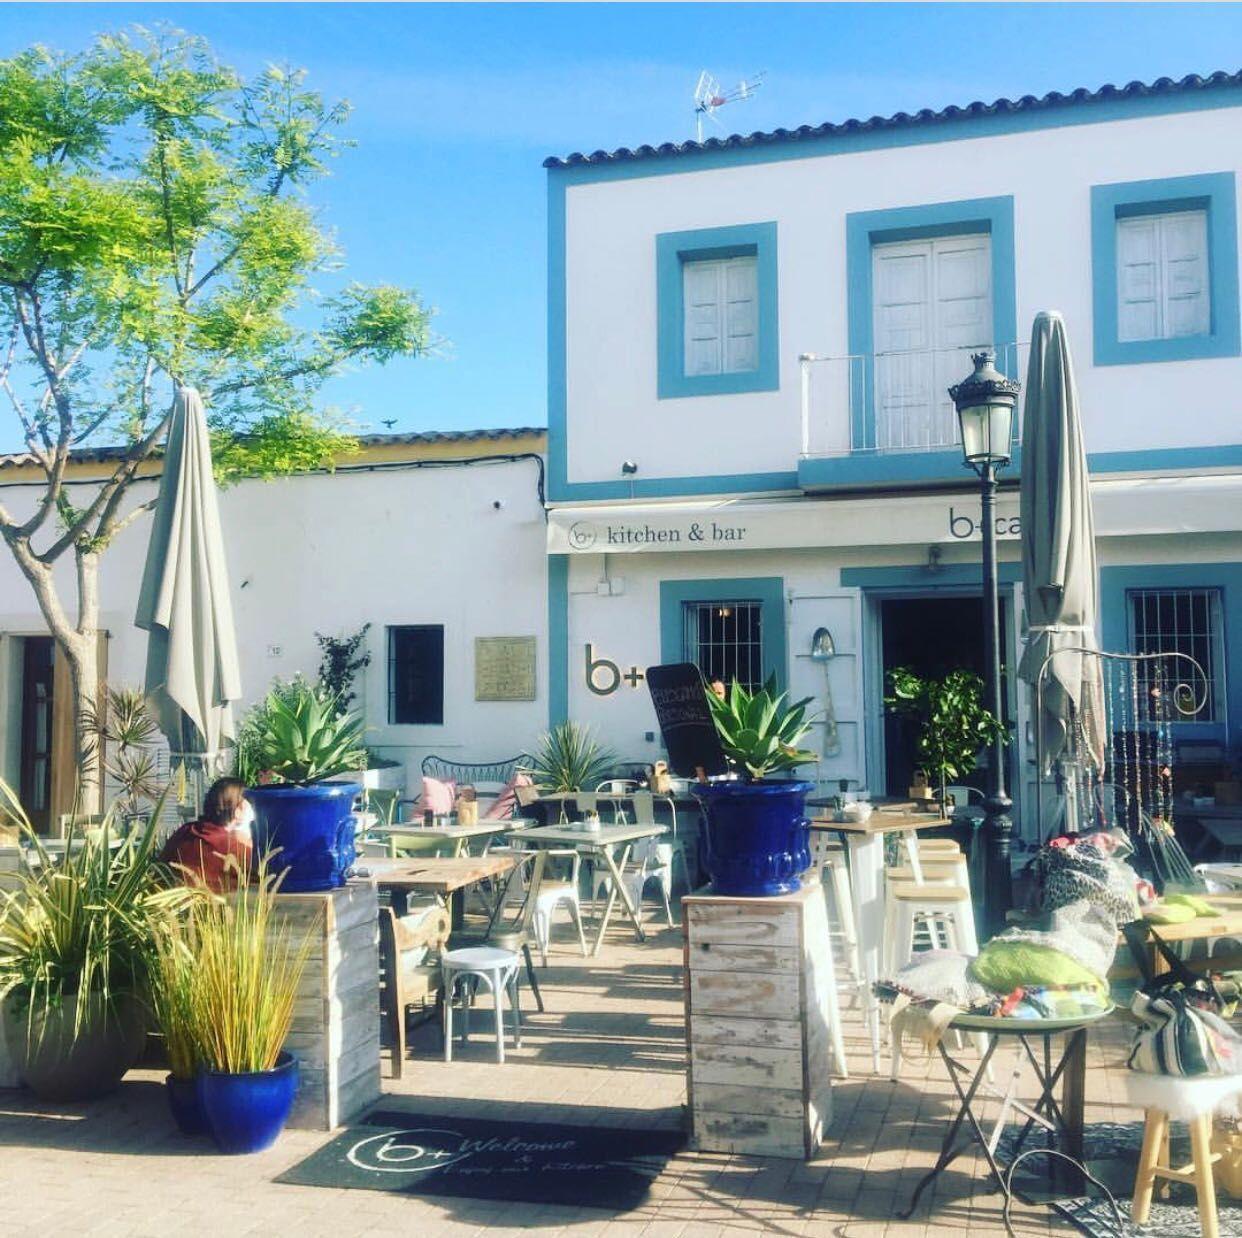 Commercial property in Ibiza, Santa Gertrudis, for rent